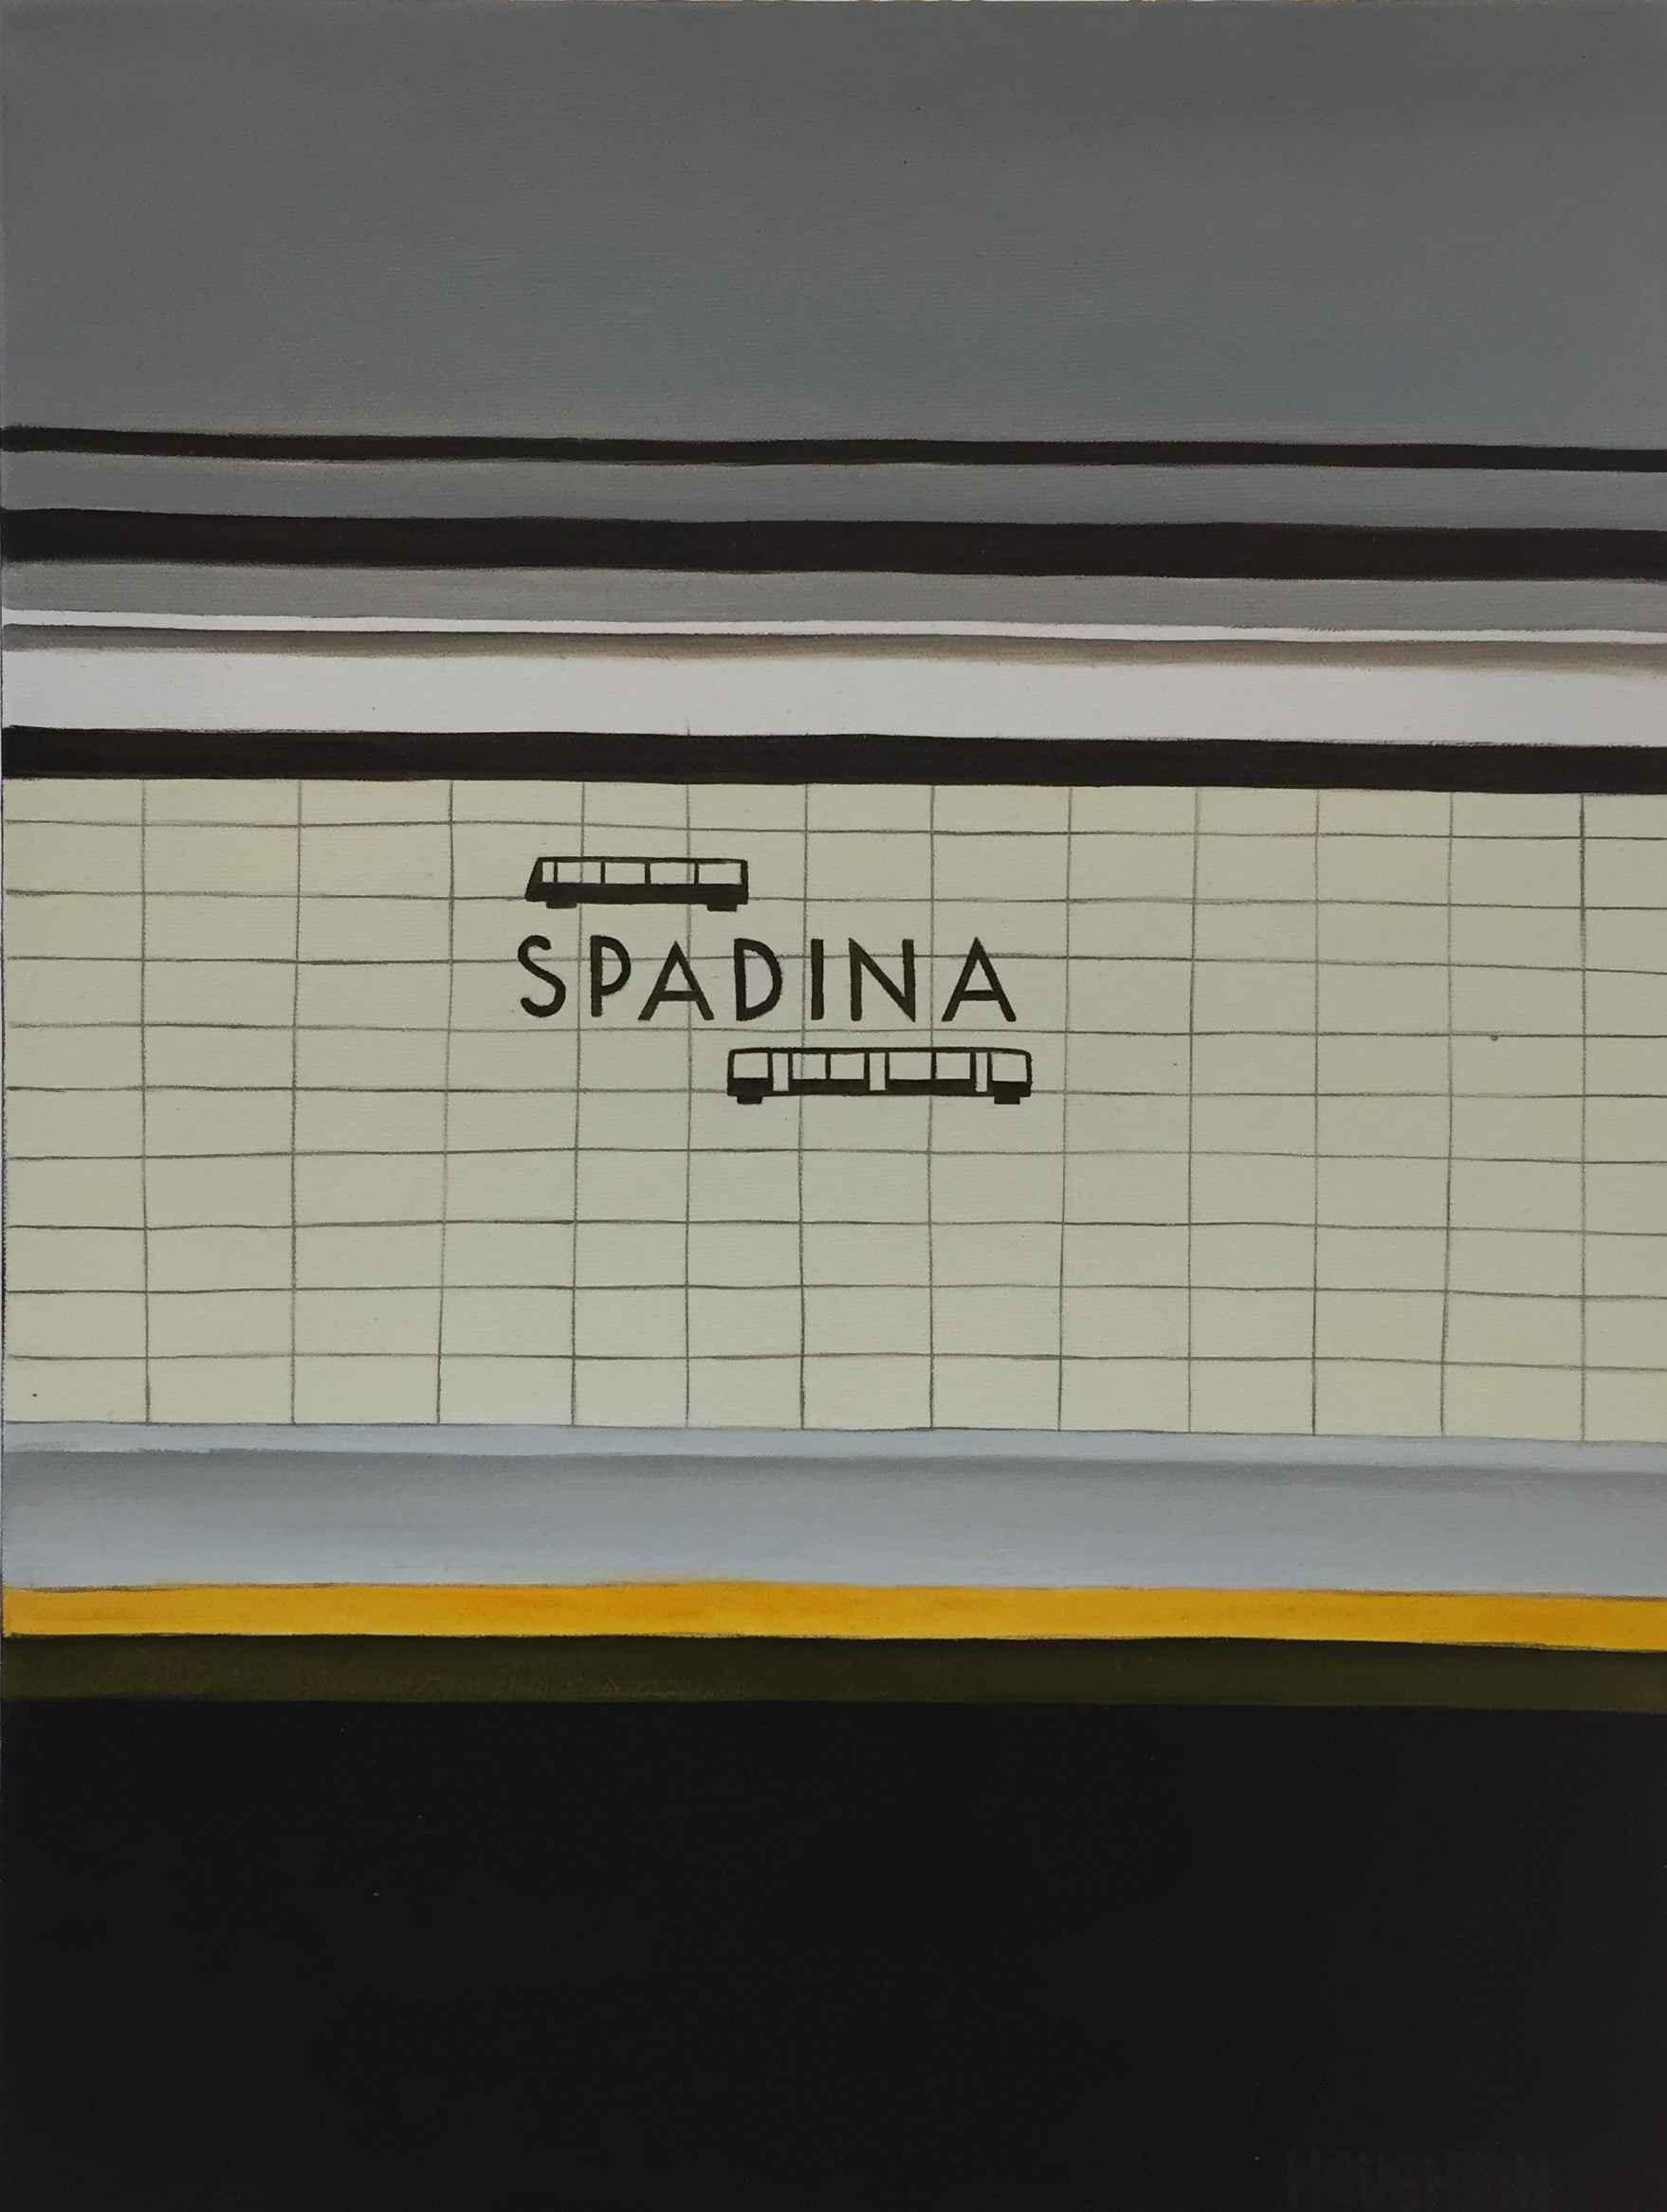 Spadina by  Jonathon Houghton - Masterpiece Online